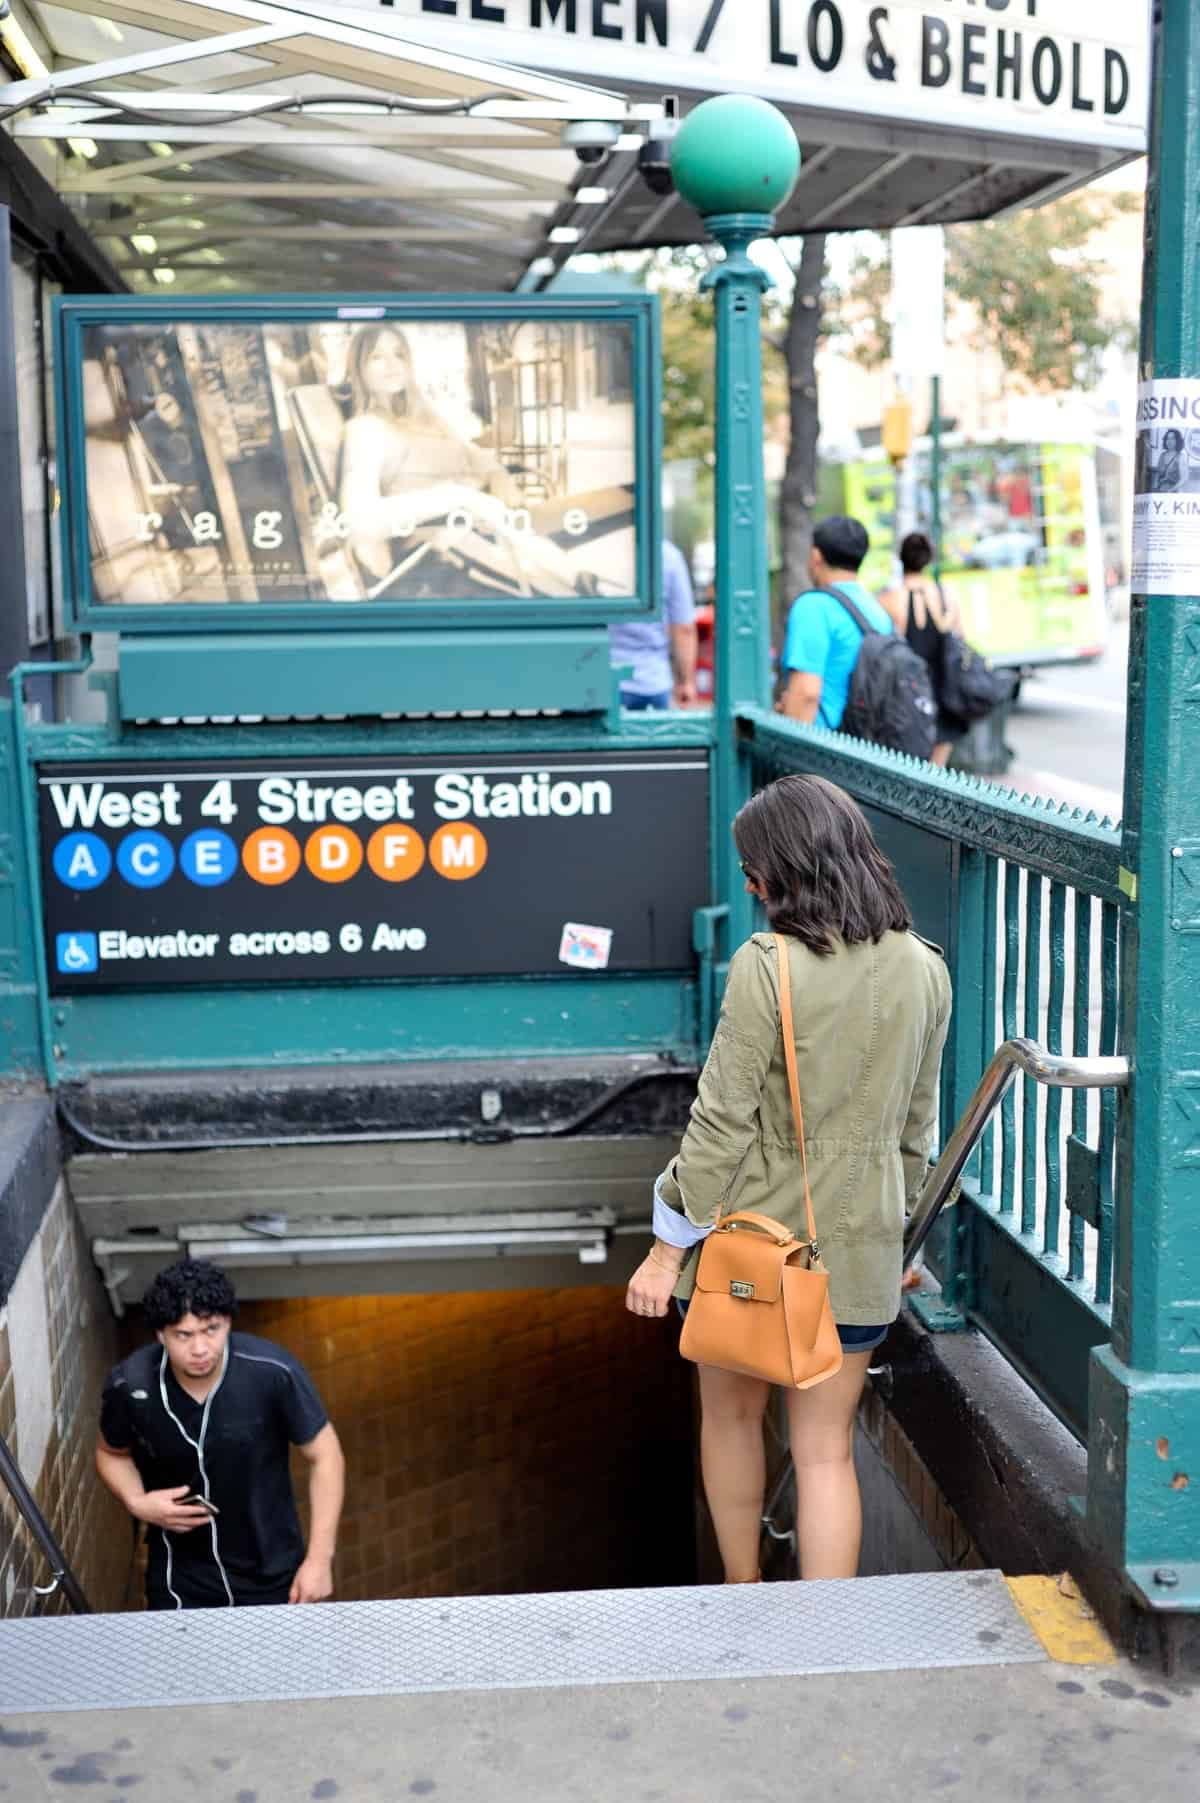 Subway photo ideas, New York City subway, Banana Republic Jacket, fall layered outfit ideas, How to wear a neck scarf, My Style Vita - @mystylevita